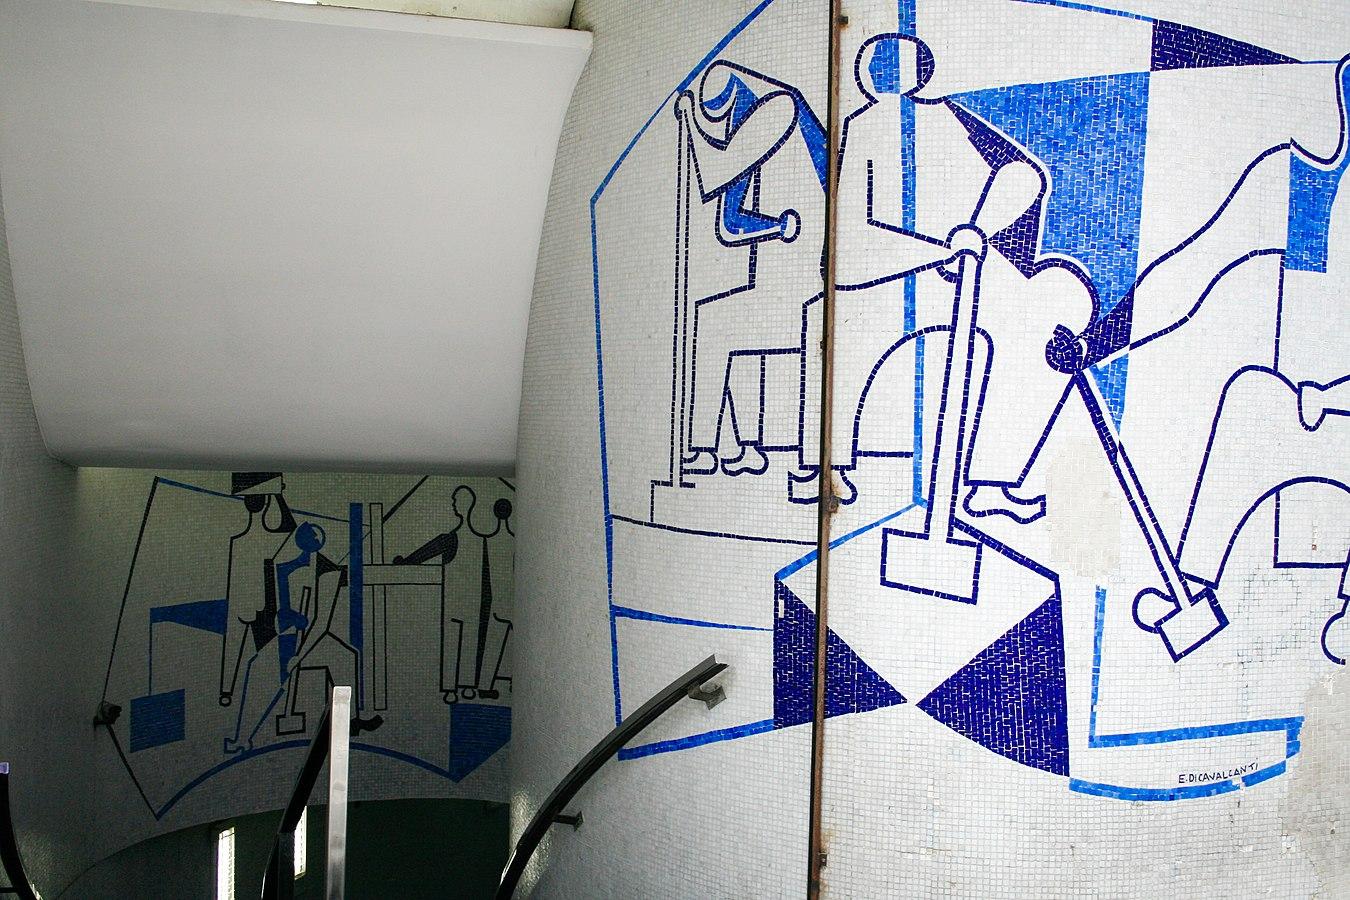 Peinture Murale Di Cavalcanti Triangle Building Crotos